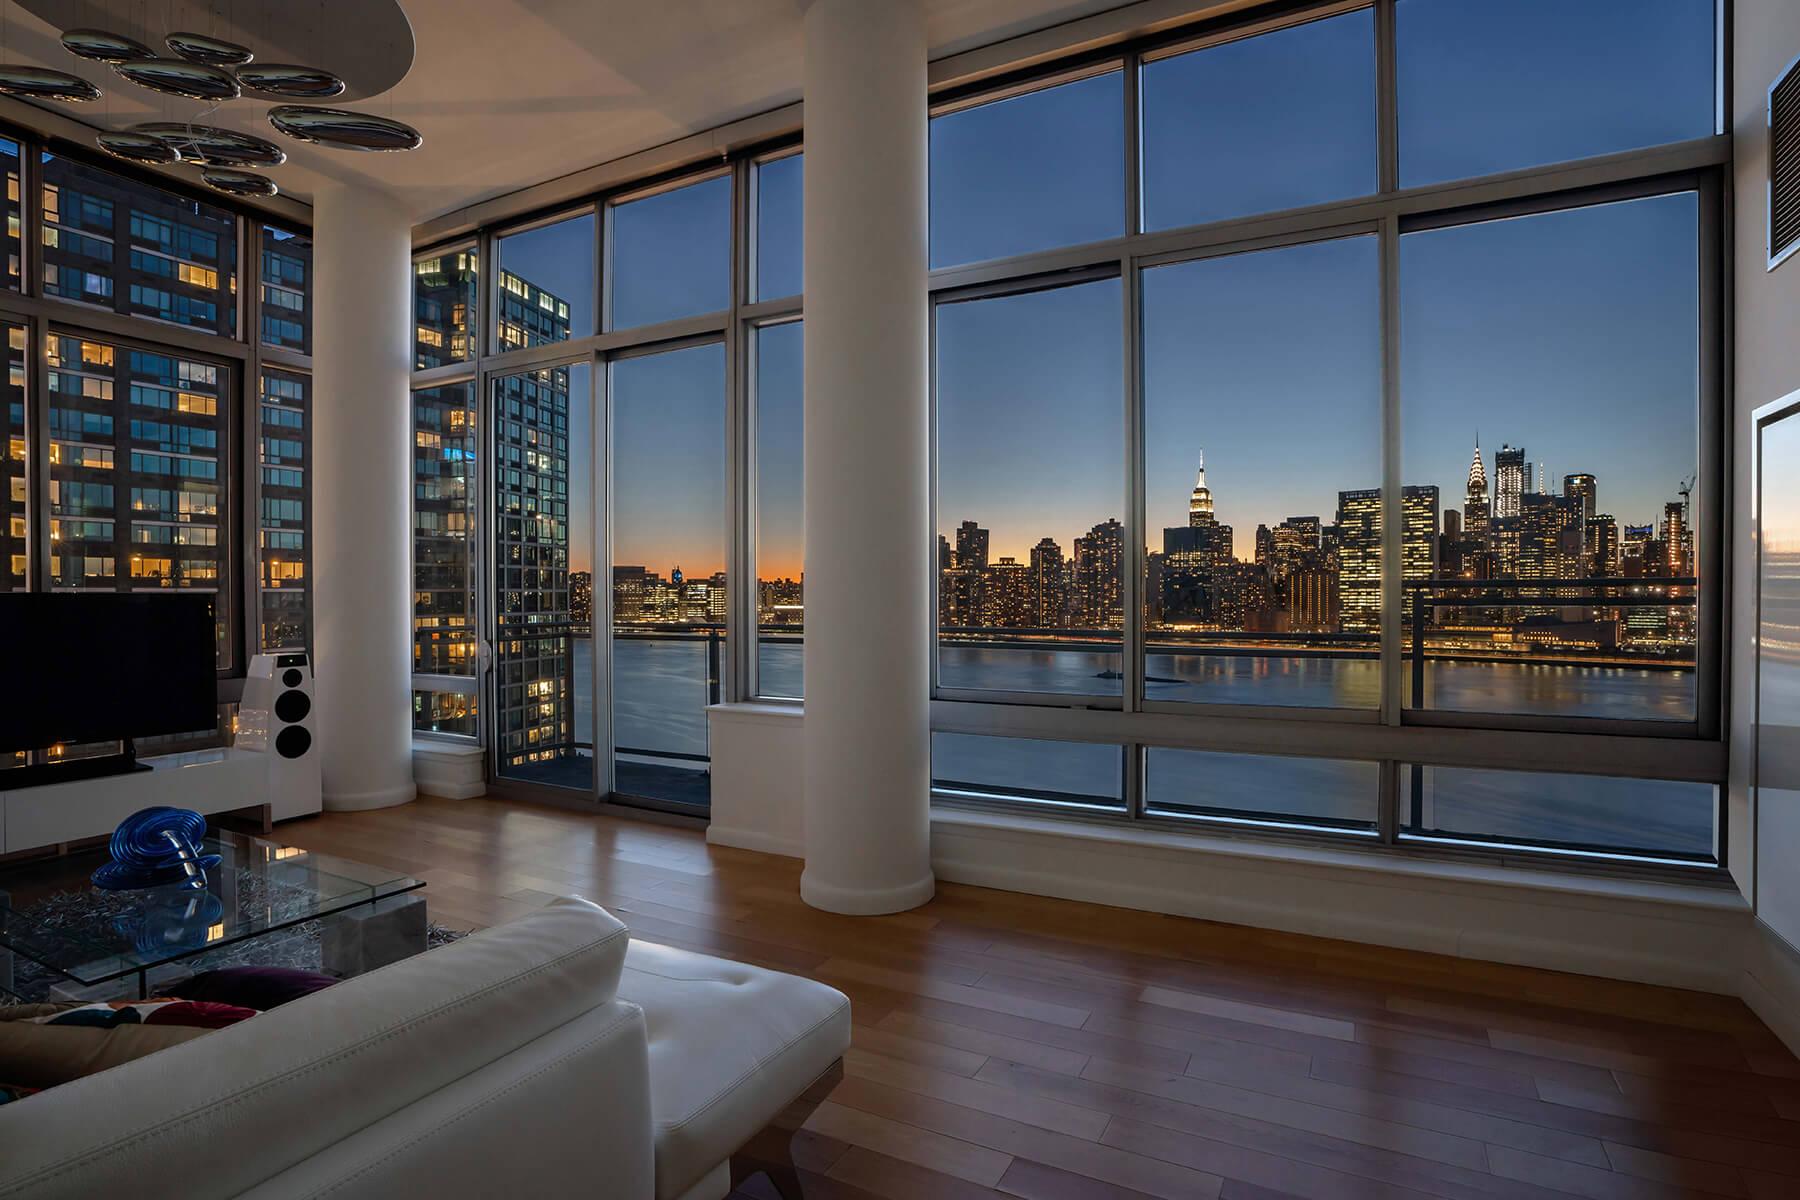 NYC Penthouse at Twilight, NY